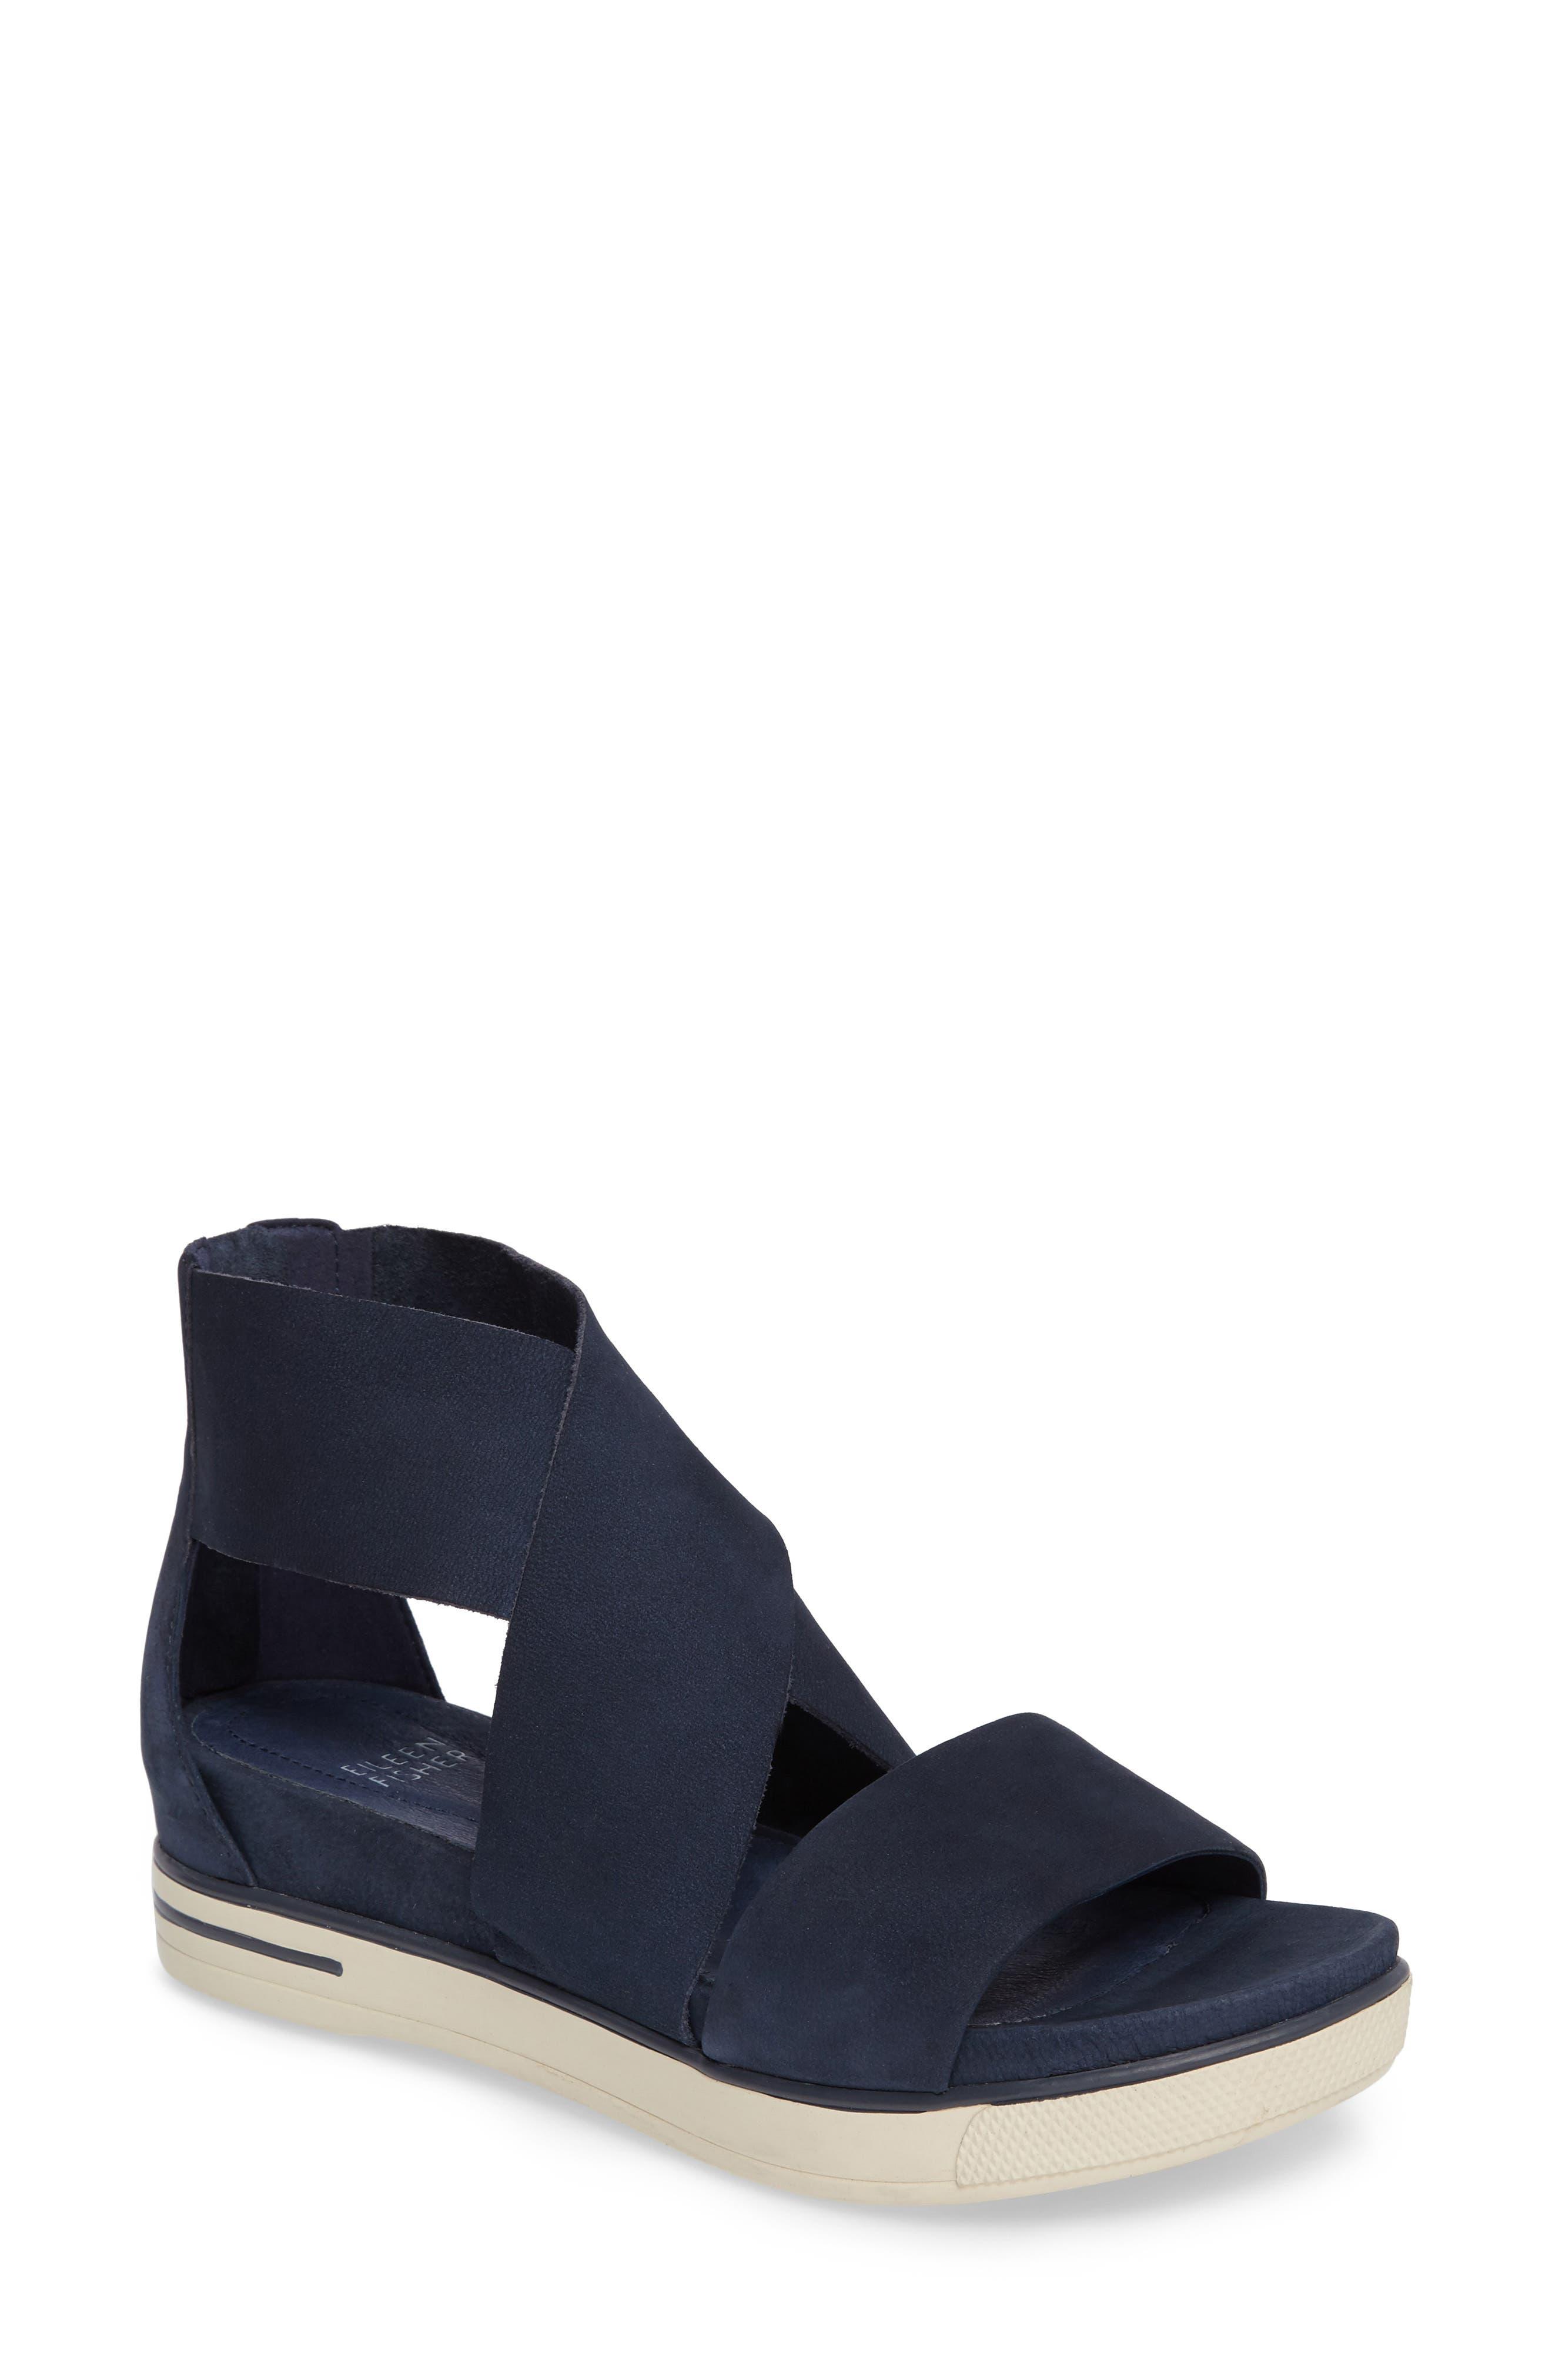 Alternate Image 1 Selected - Eileen Fisher Sport Platform Sandal